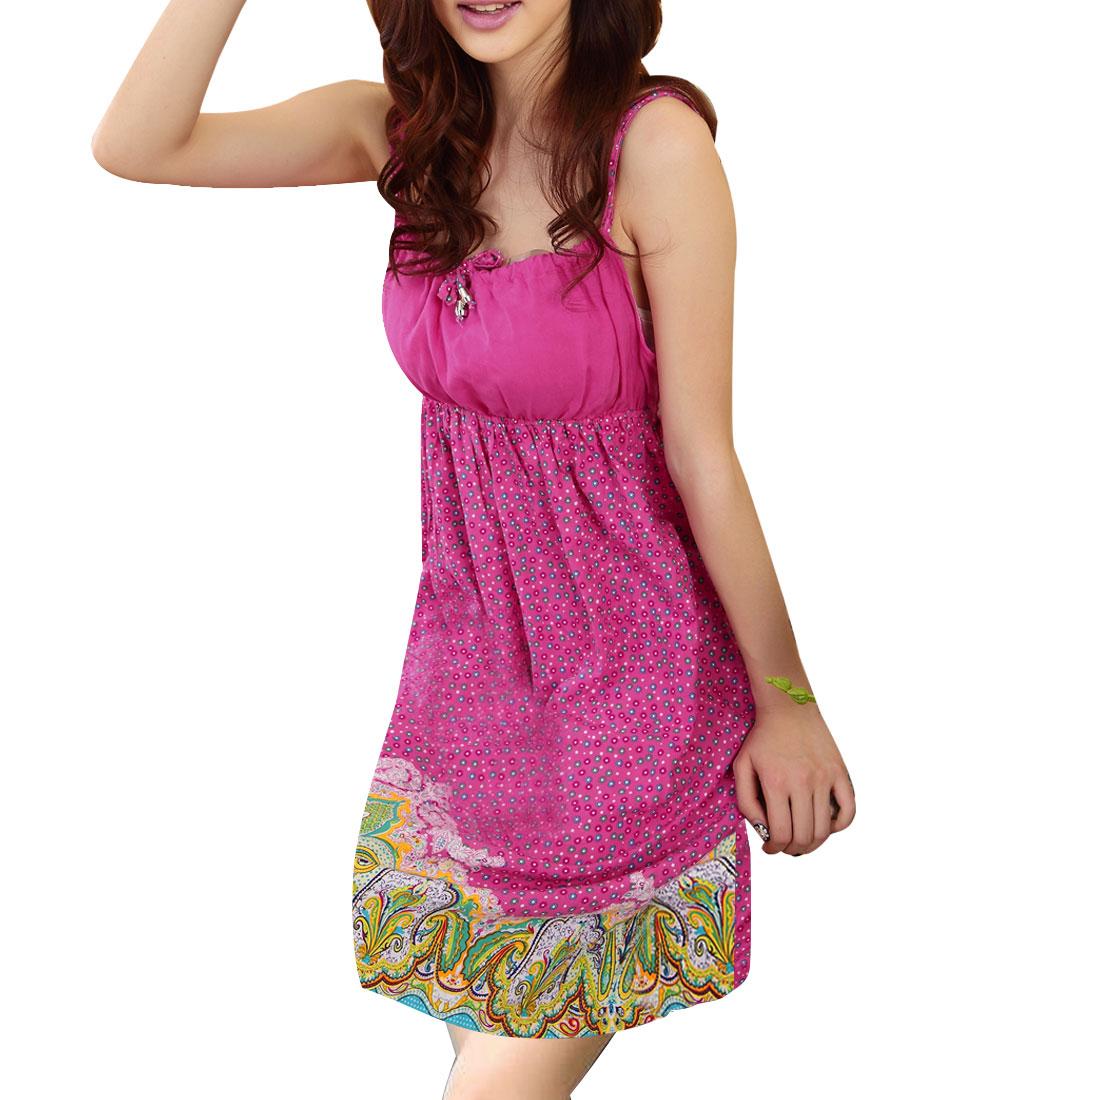 0405 Ladies Colorful Paisley Flower Pattern Sleeveless Fuchsia Sleep Dress